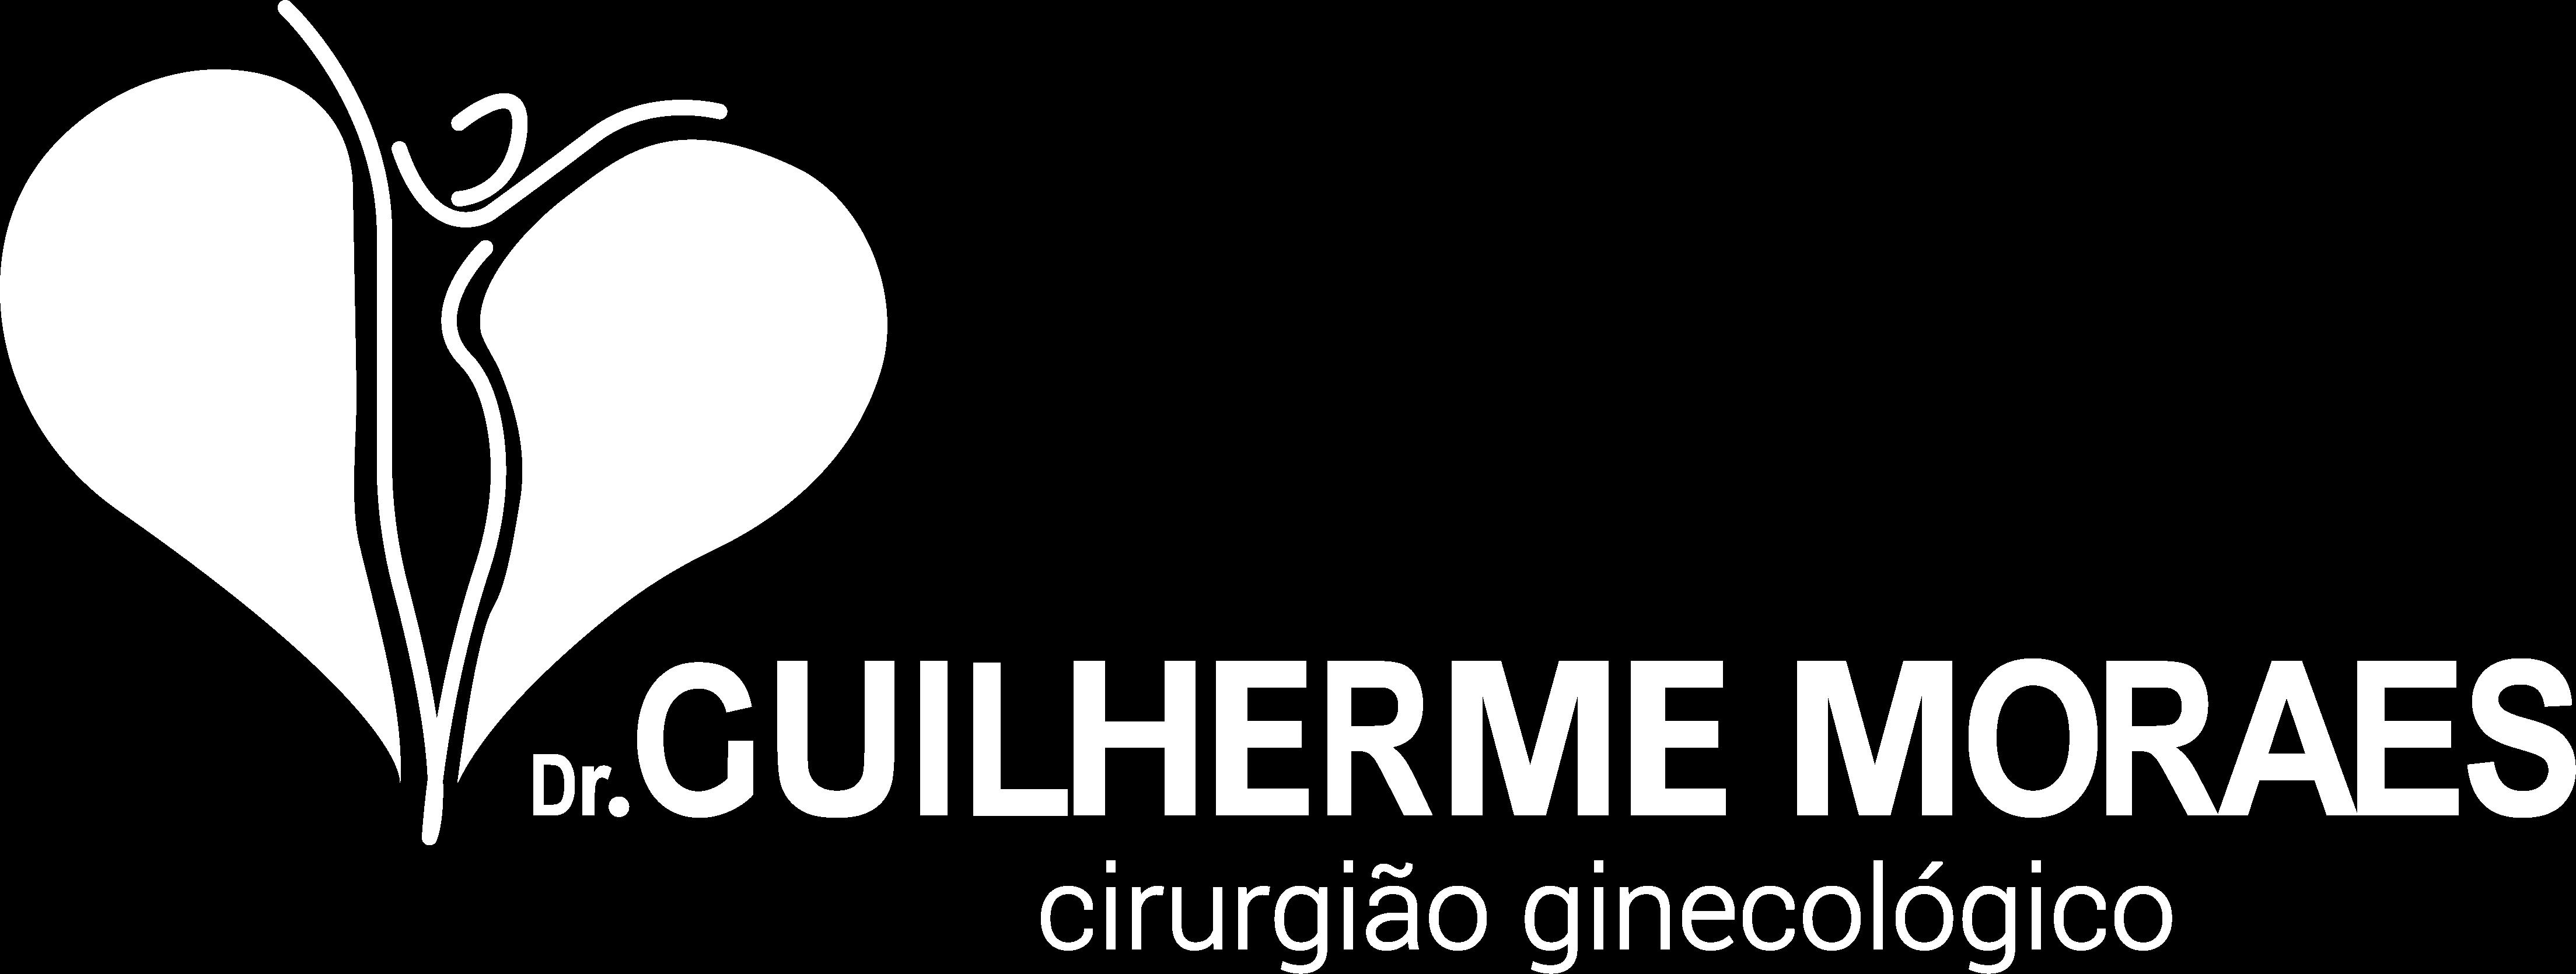 logomarca de Dr. Guilherme Moraes